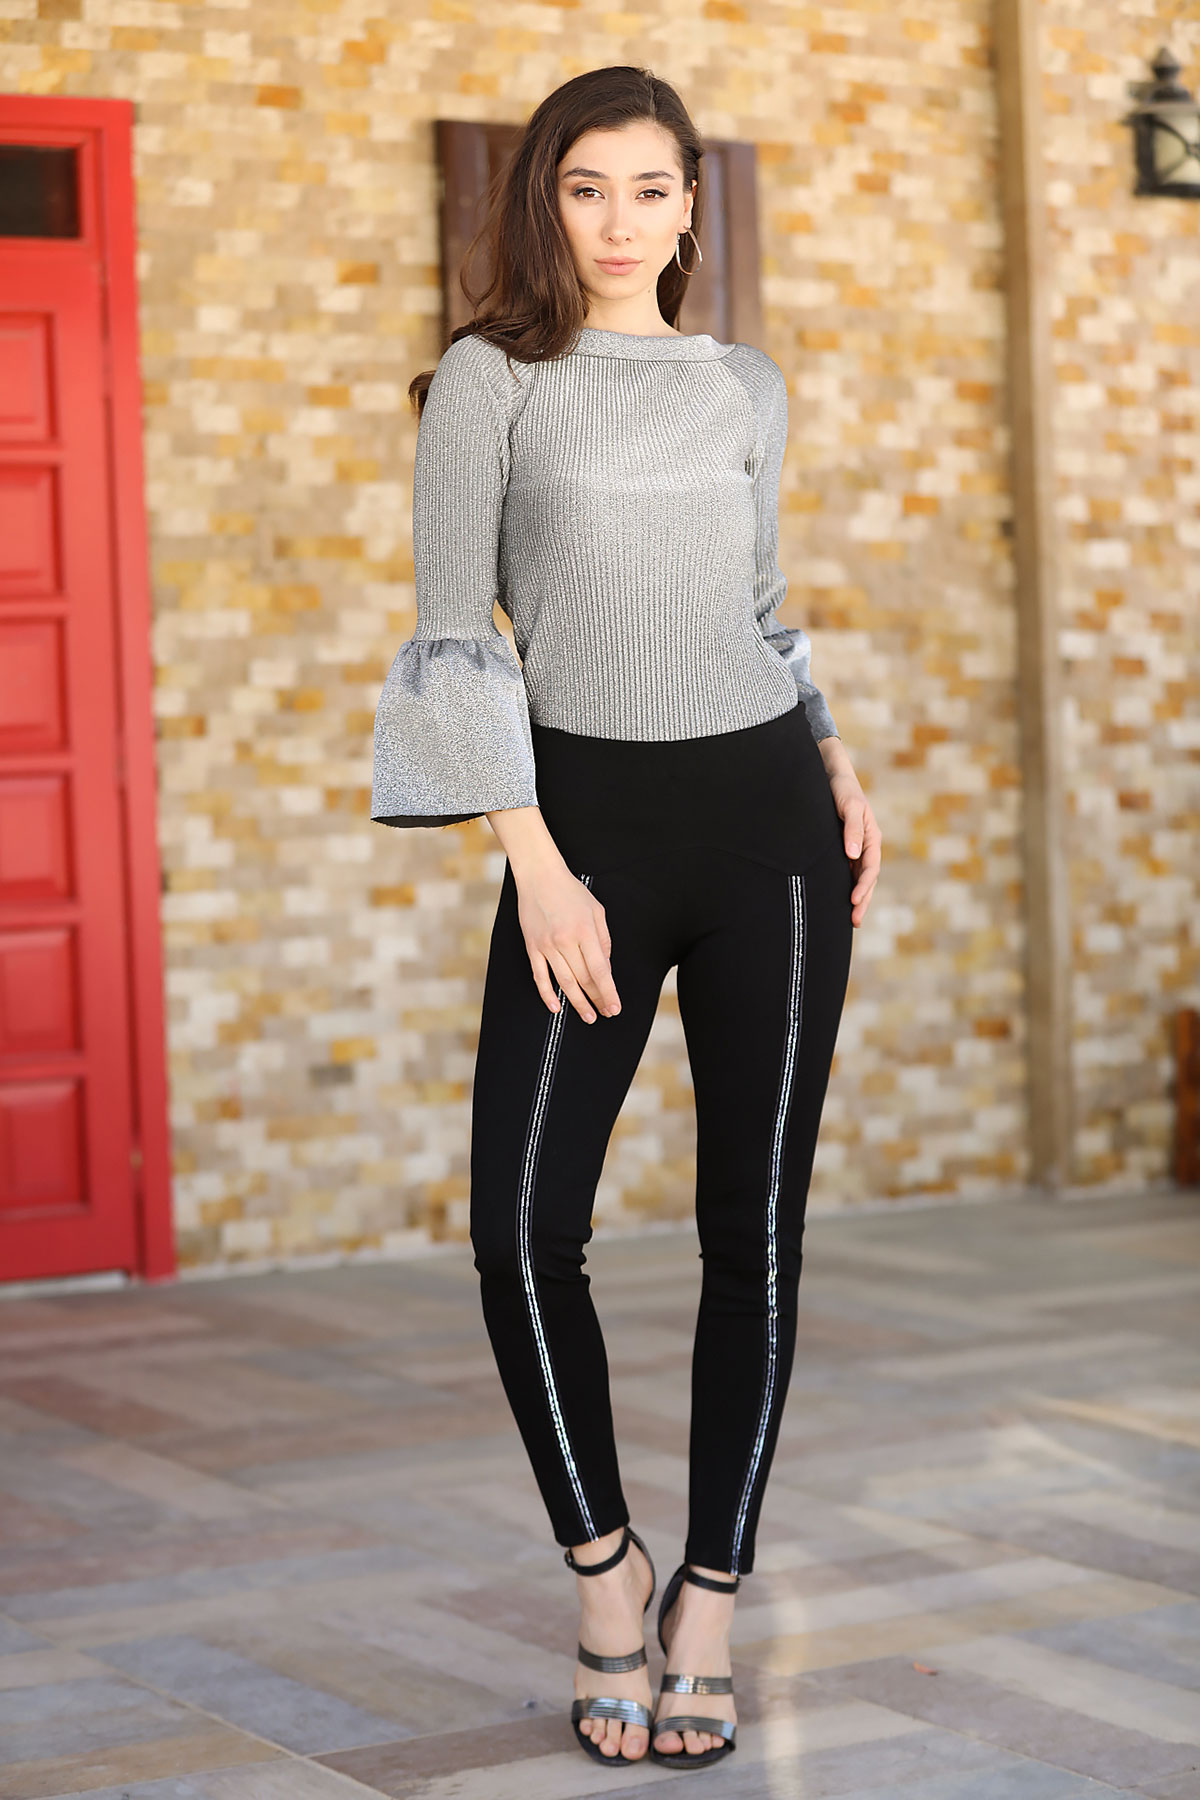 Women's Glitter Strip Black Tights